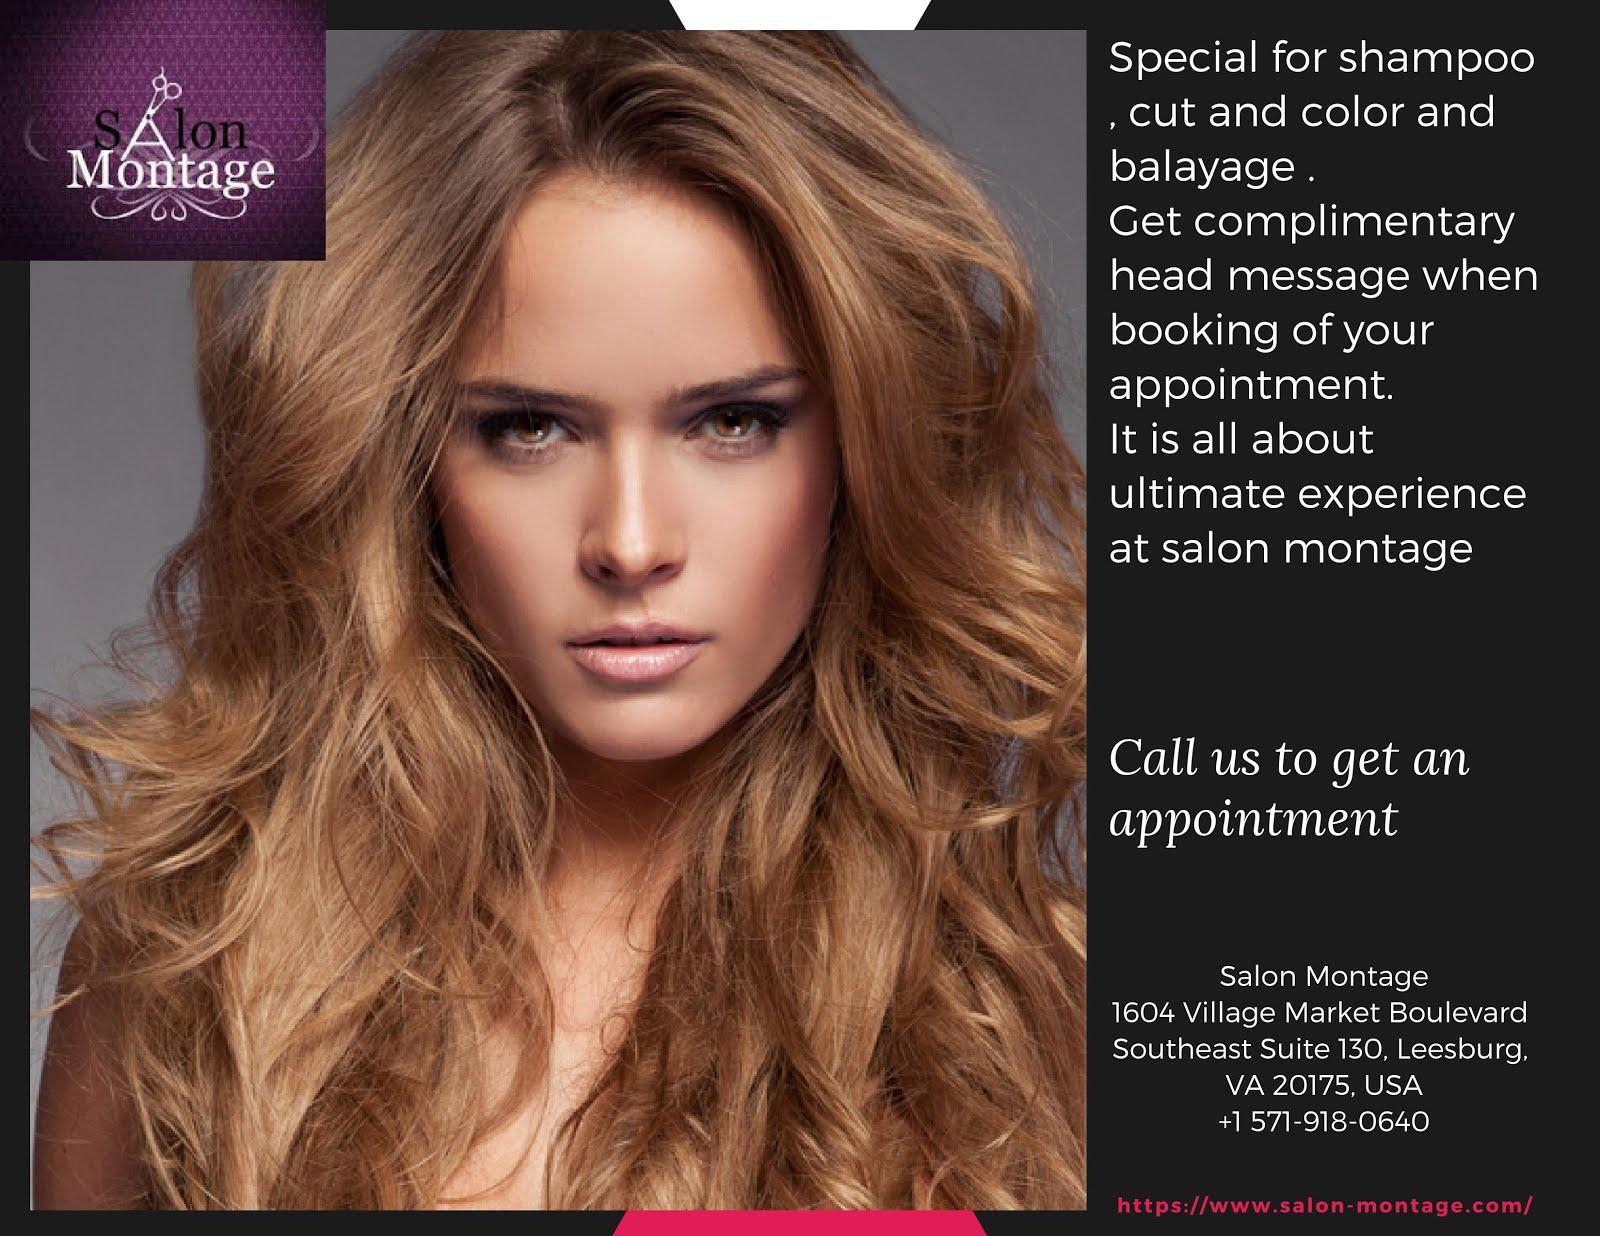 Salon Montage offers